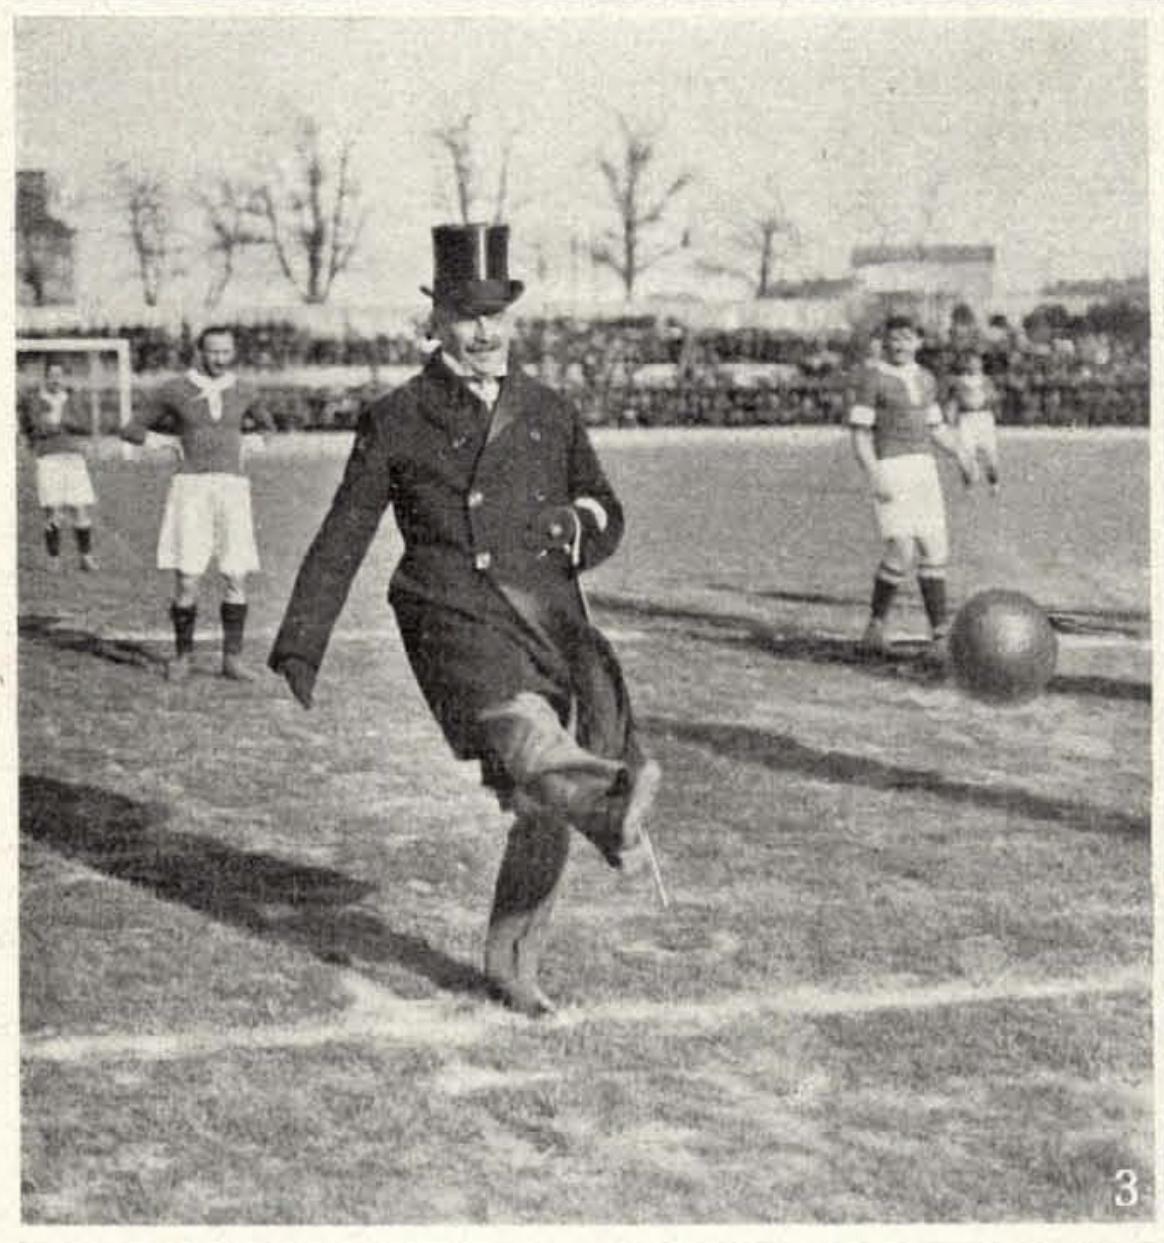 vasarnapiujsag1912b.jpg